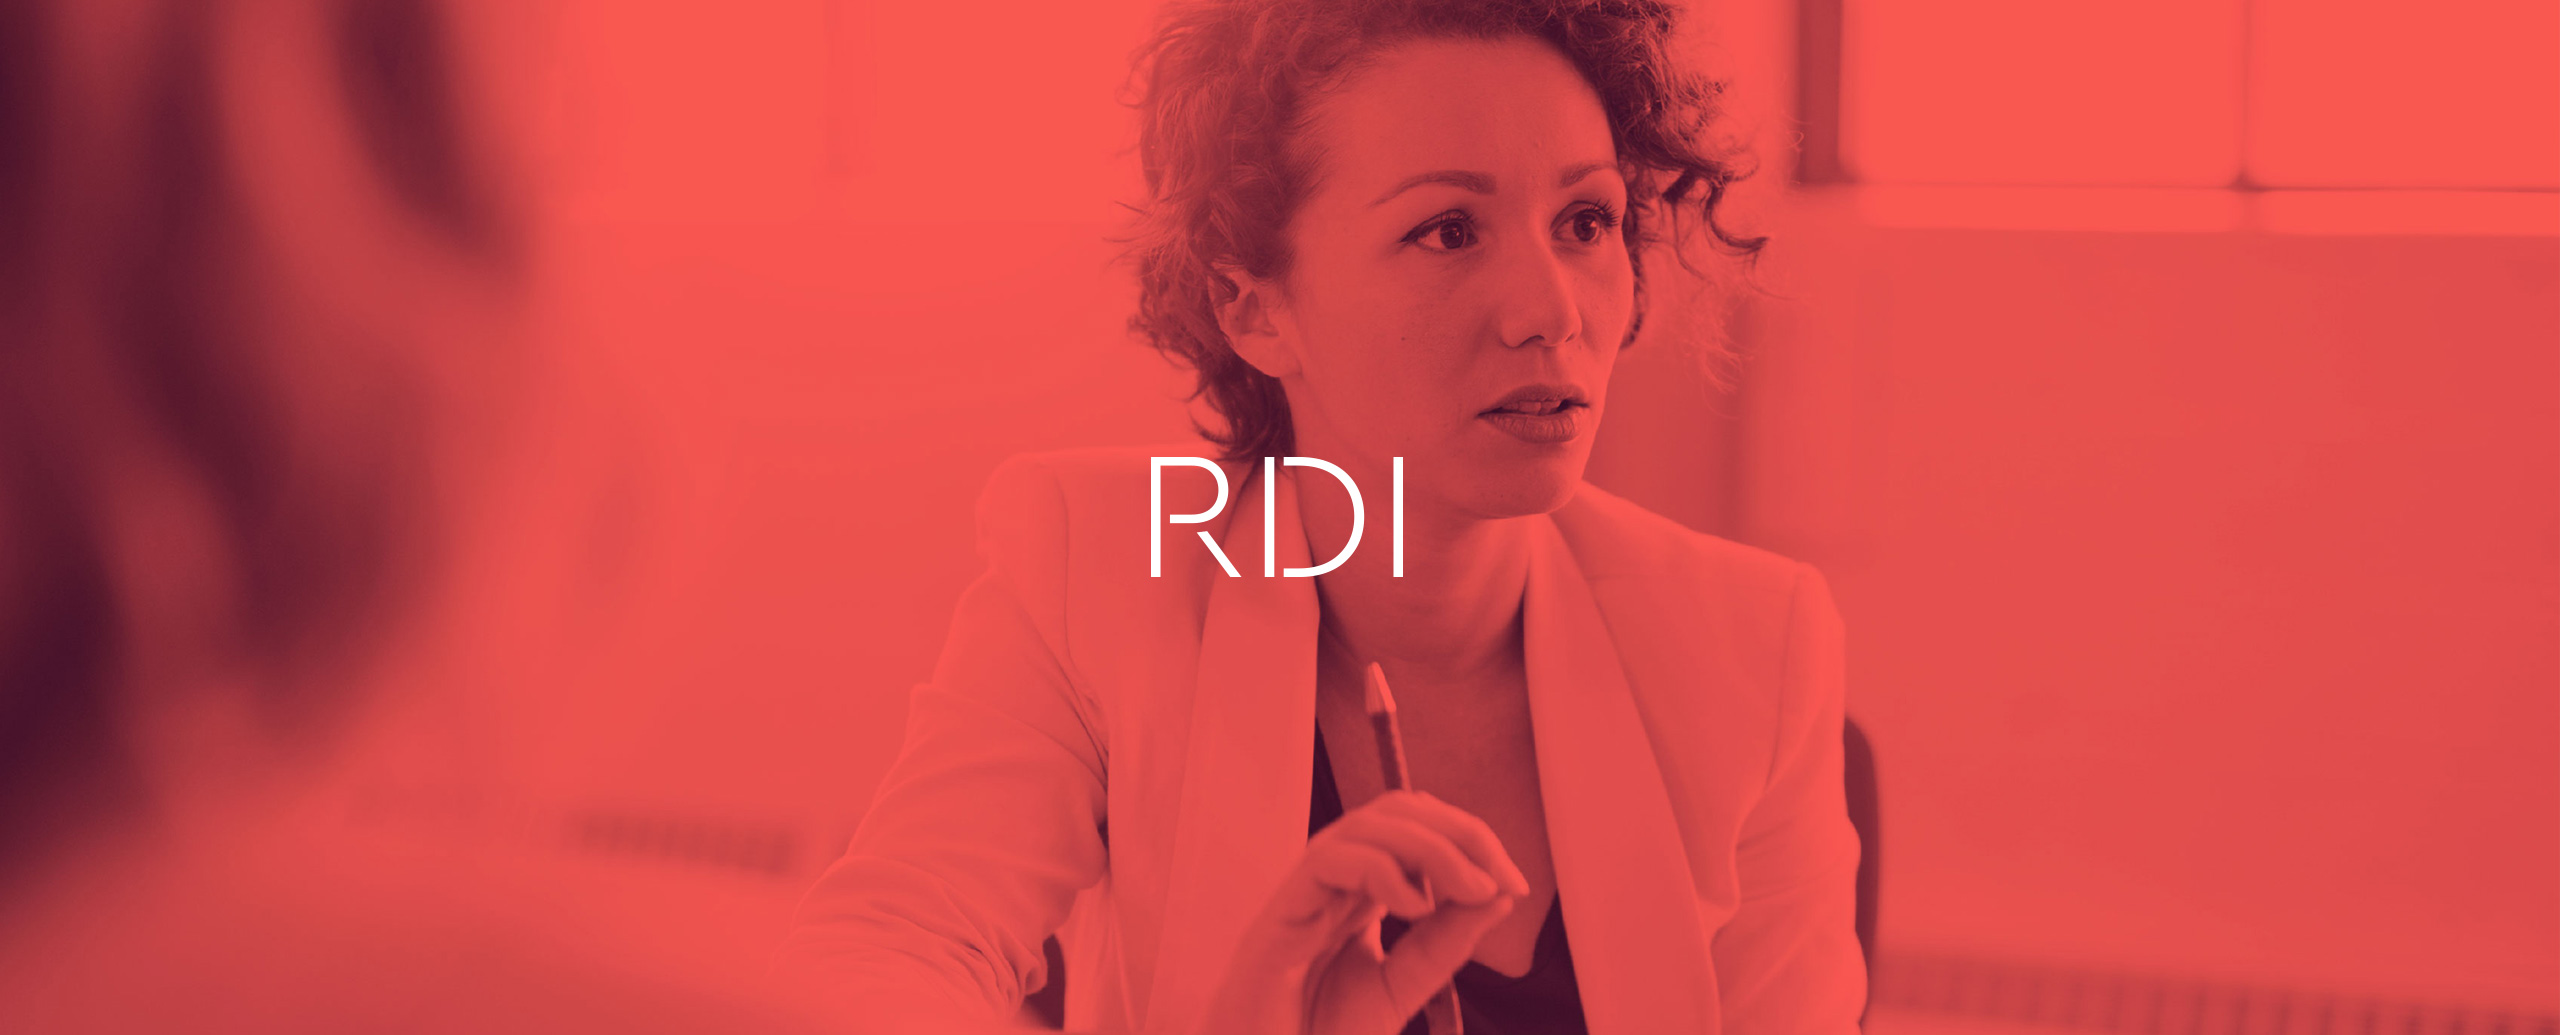 RDI_Header